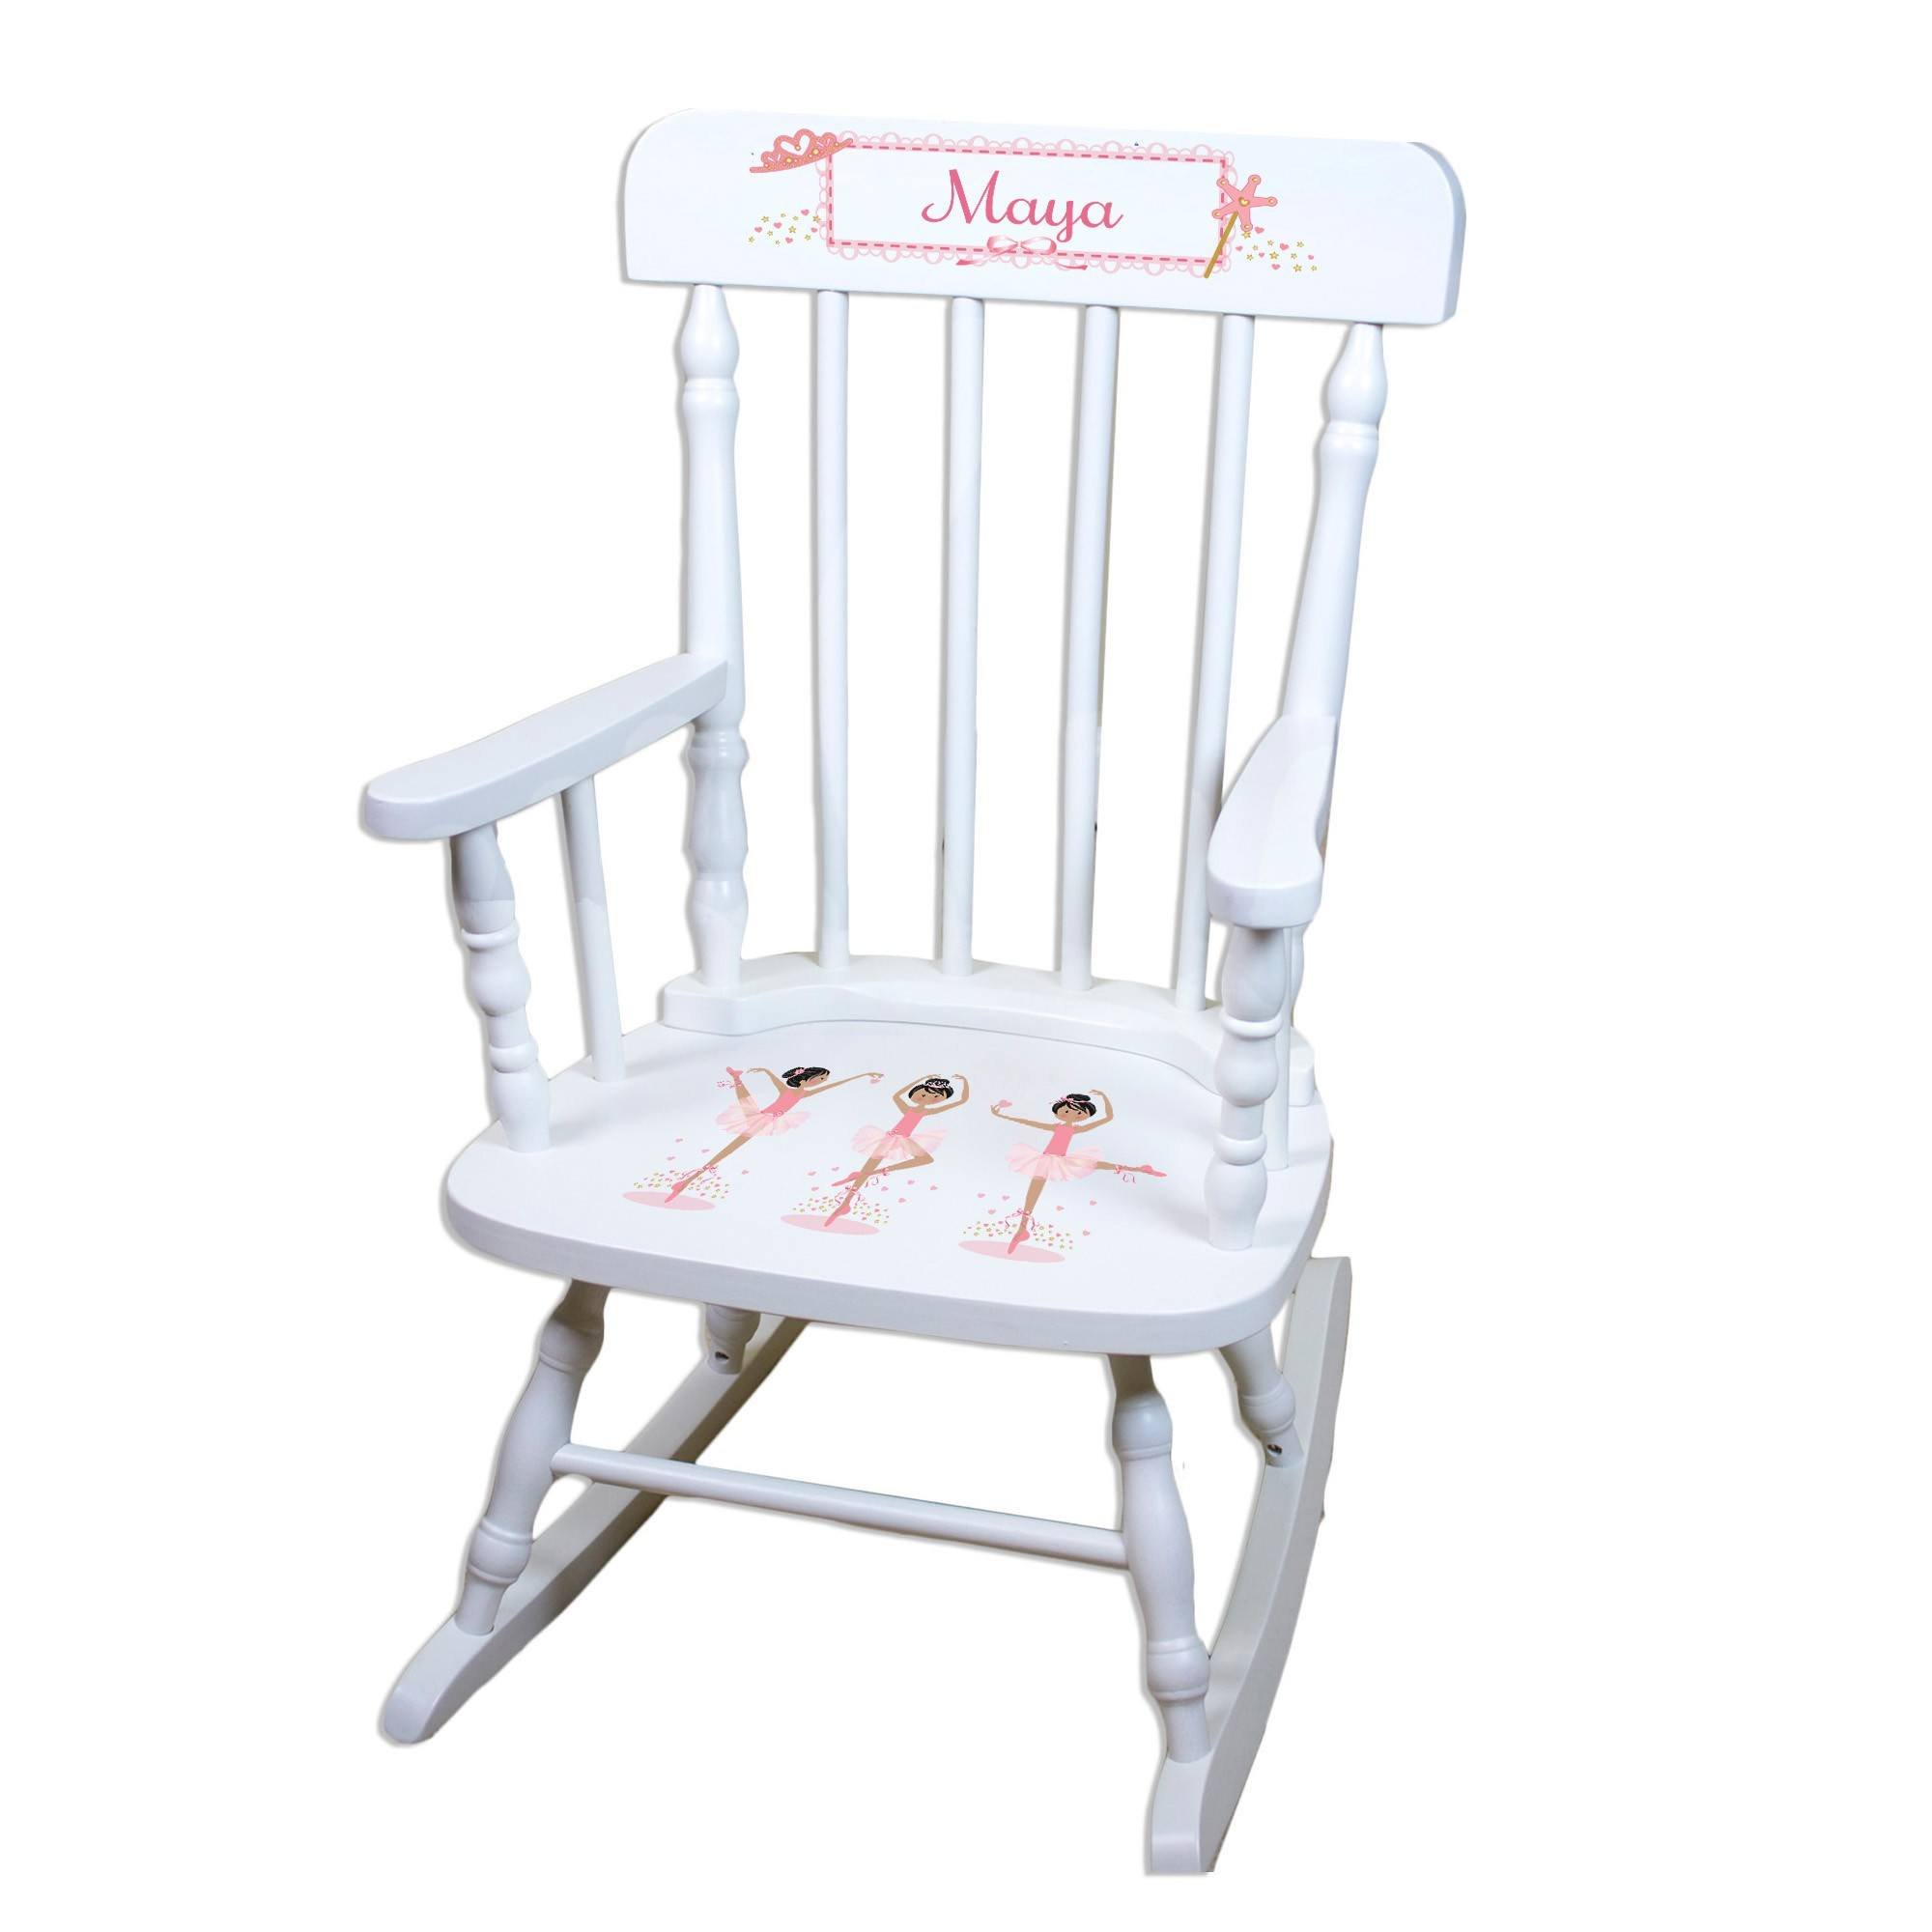 MyBambino Personalized Ballerina black hair White Wooden Childrens Rocking Chair